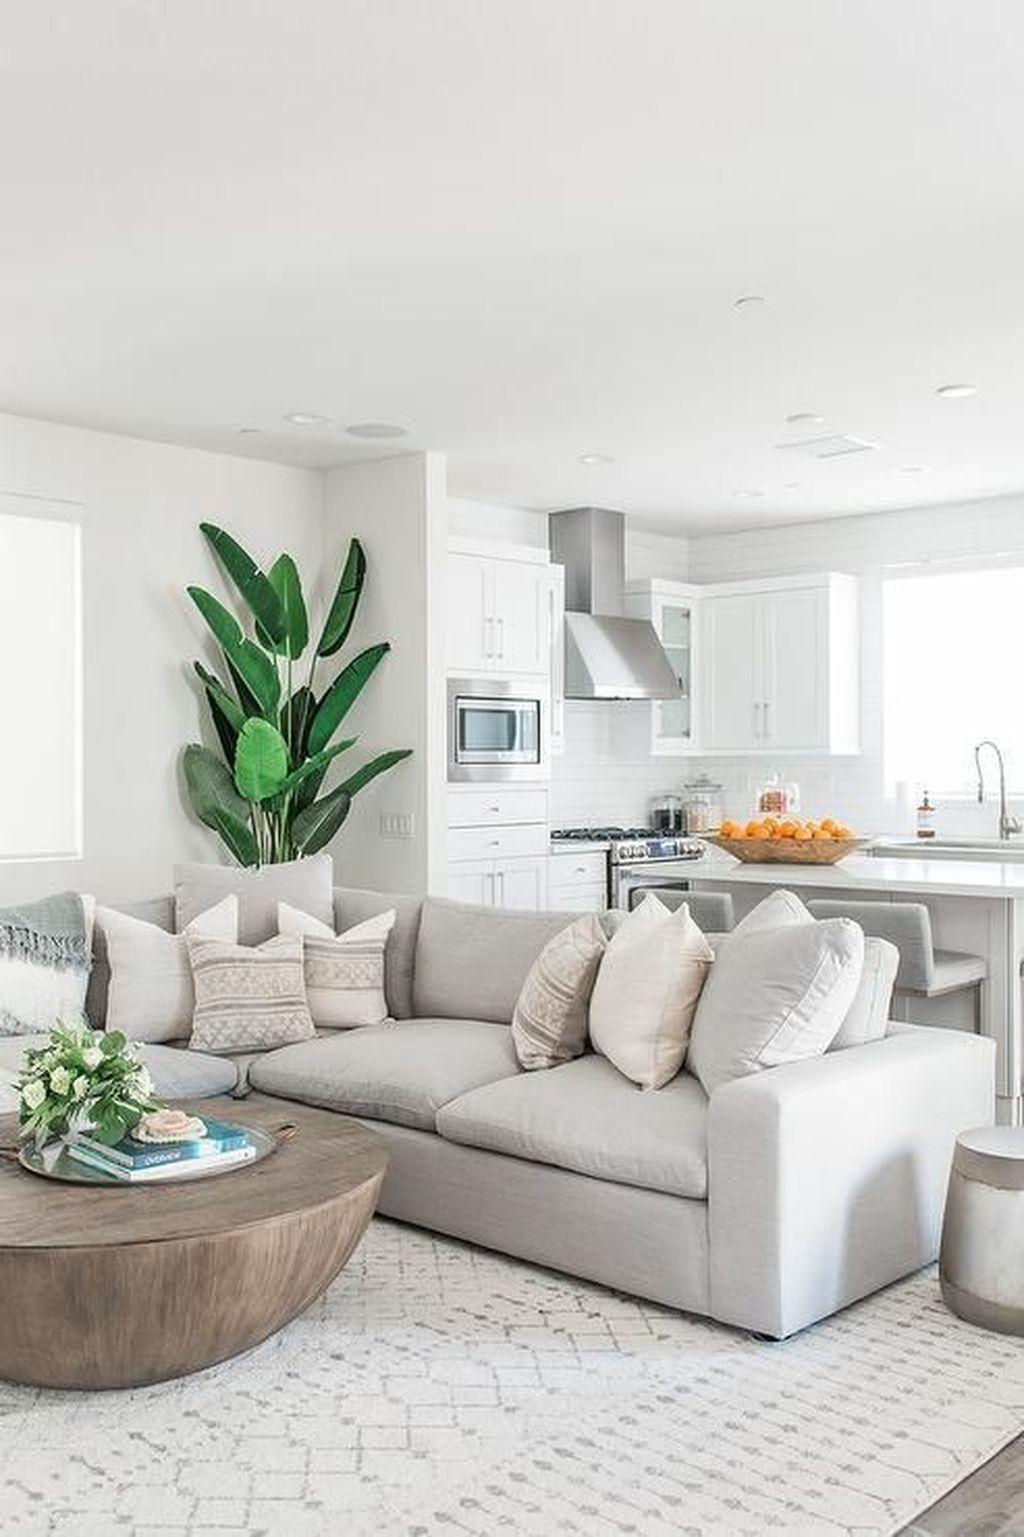 35 Classy Small Living Room Designs Ideas For Best Inspiration In 2020 White Living Room Decor Modern White Living Room Small Apartment Living Room